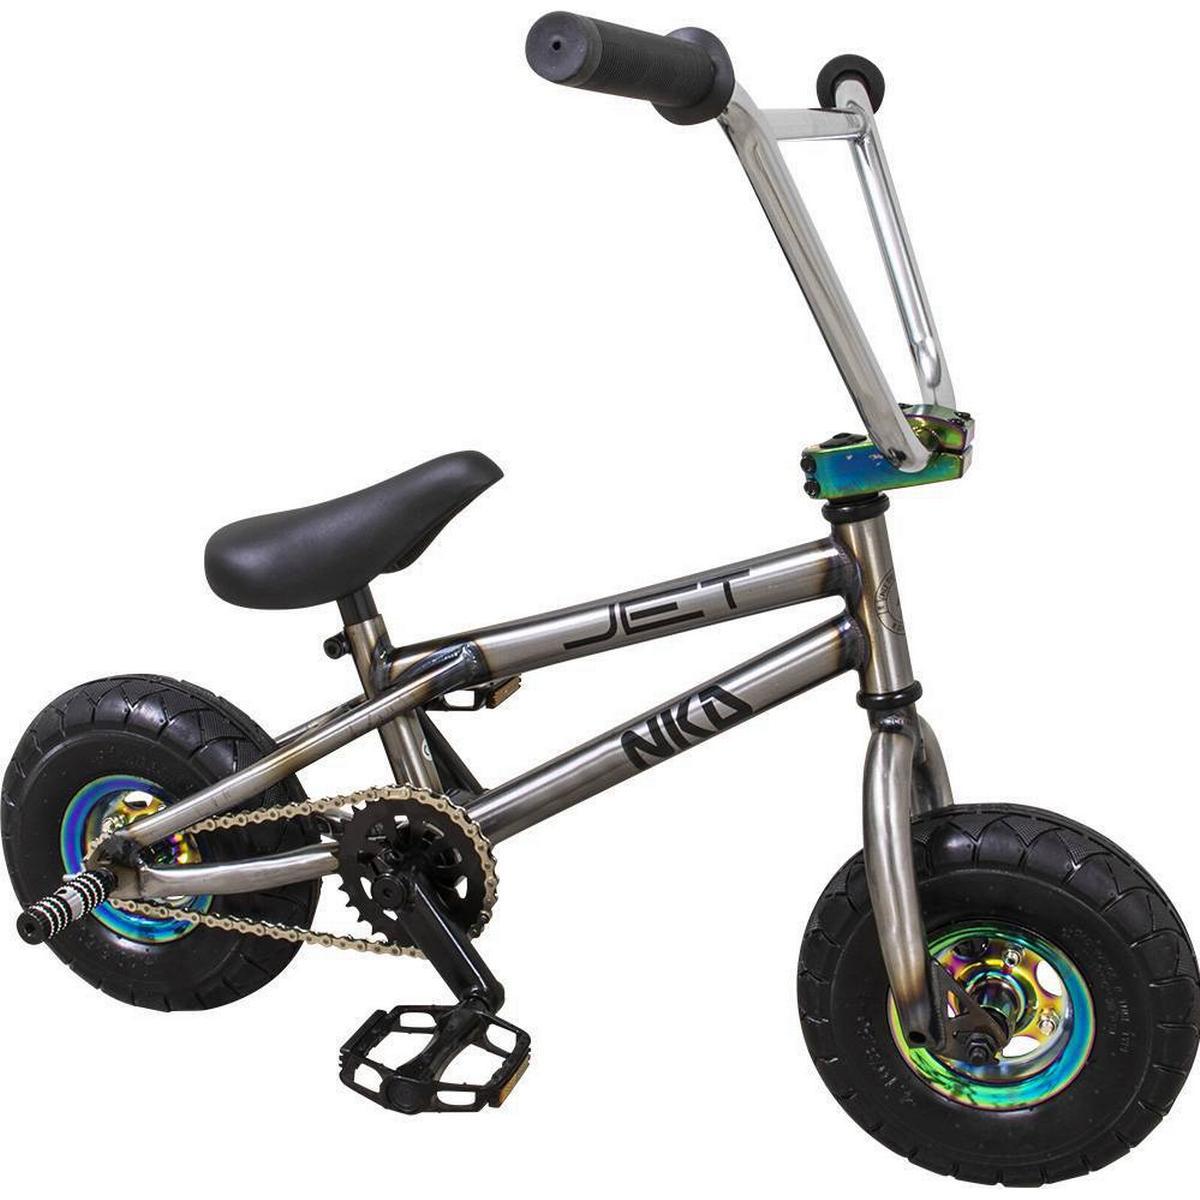 "Rooster Core 9.5/"" Frame 18/"" Wheel Boys BMX Bike Blue"